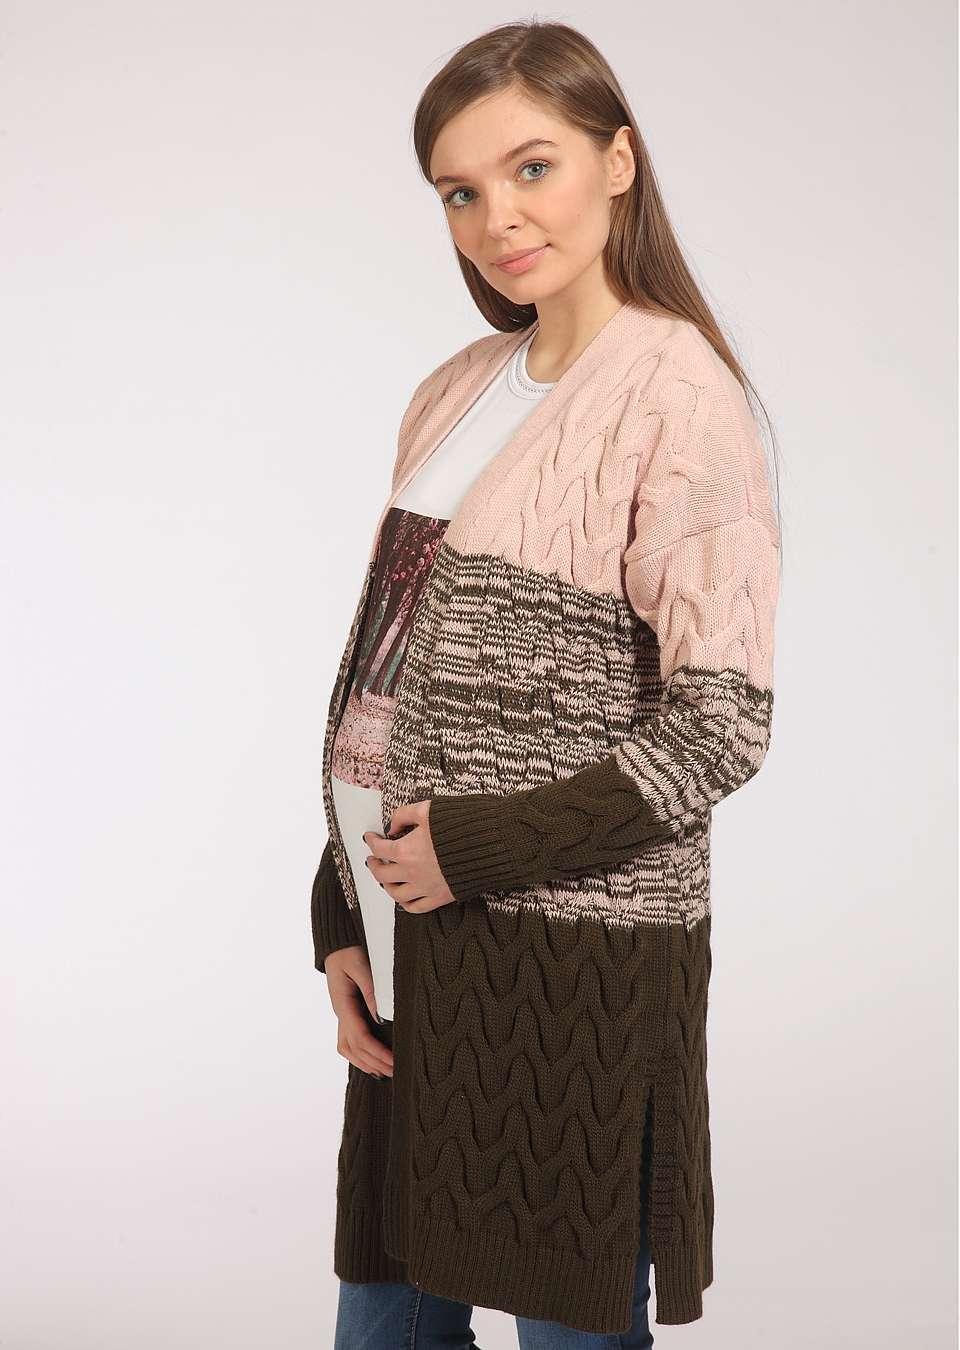 Кардиган для беременных Монэ